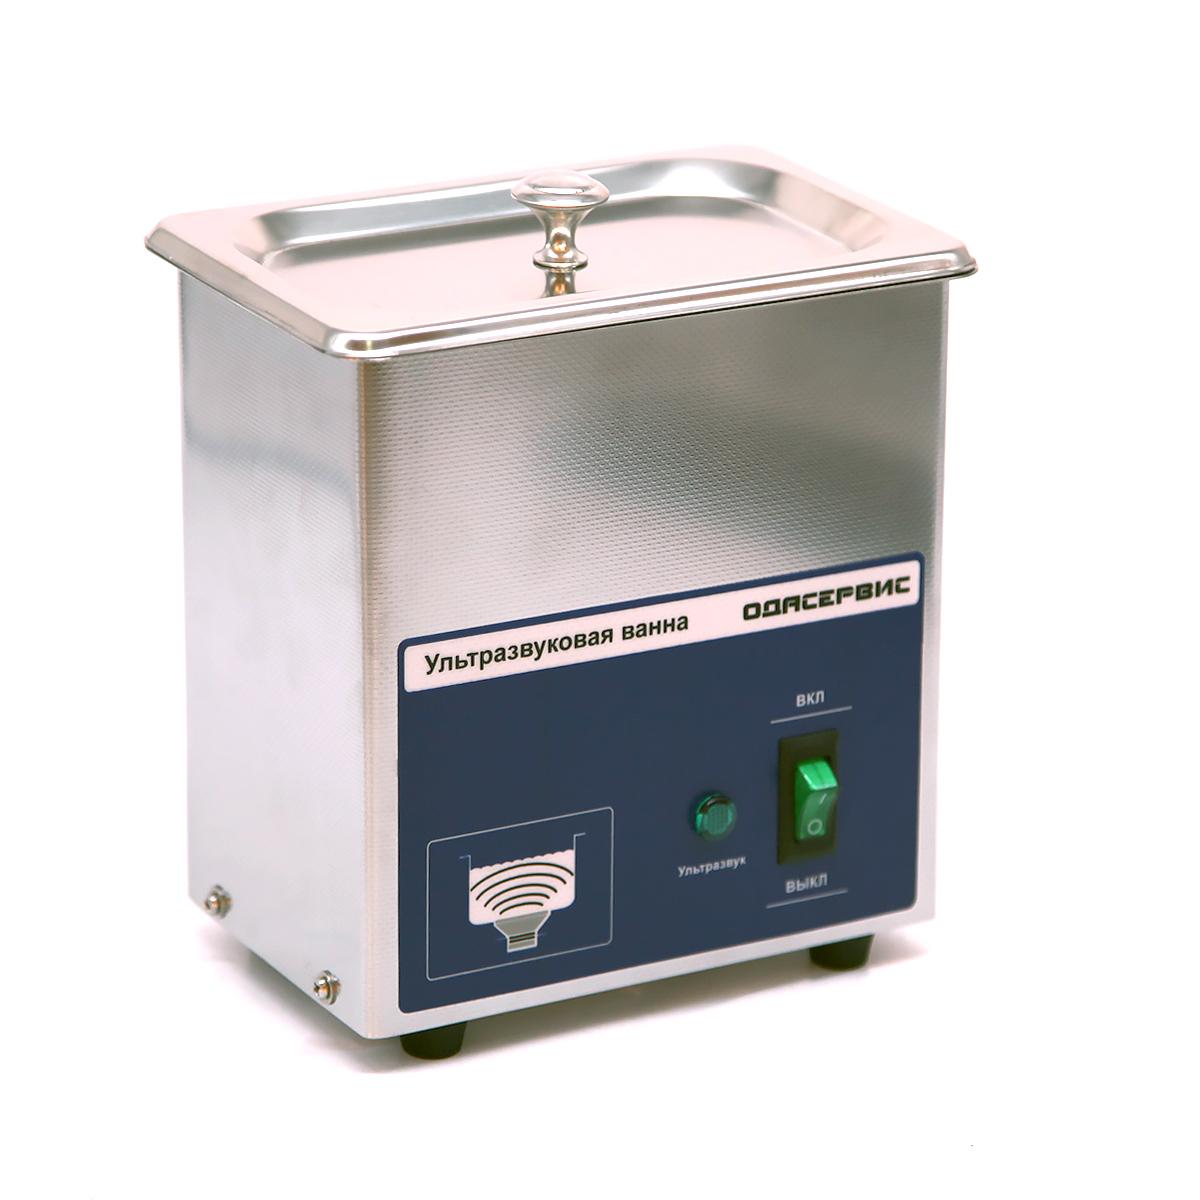 Ультразвуковая ванна 0,7 л ОДА Сервис ODA-M07